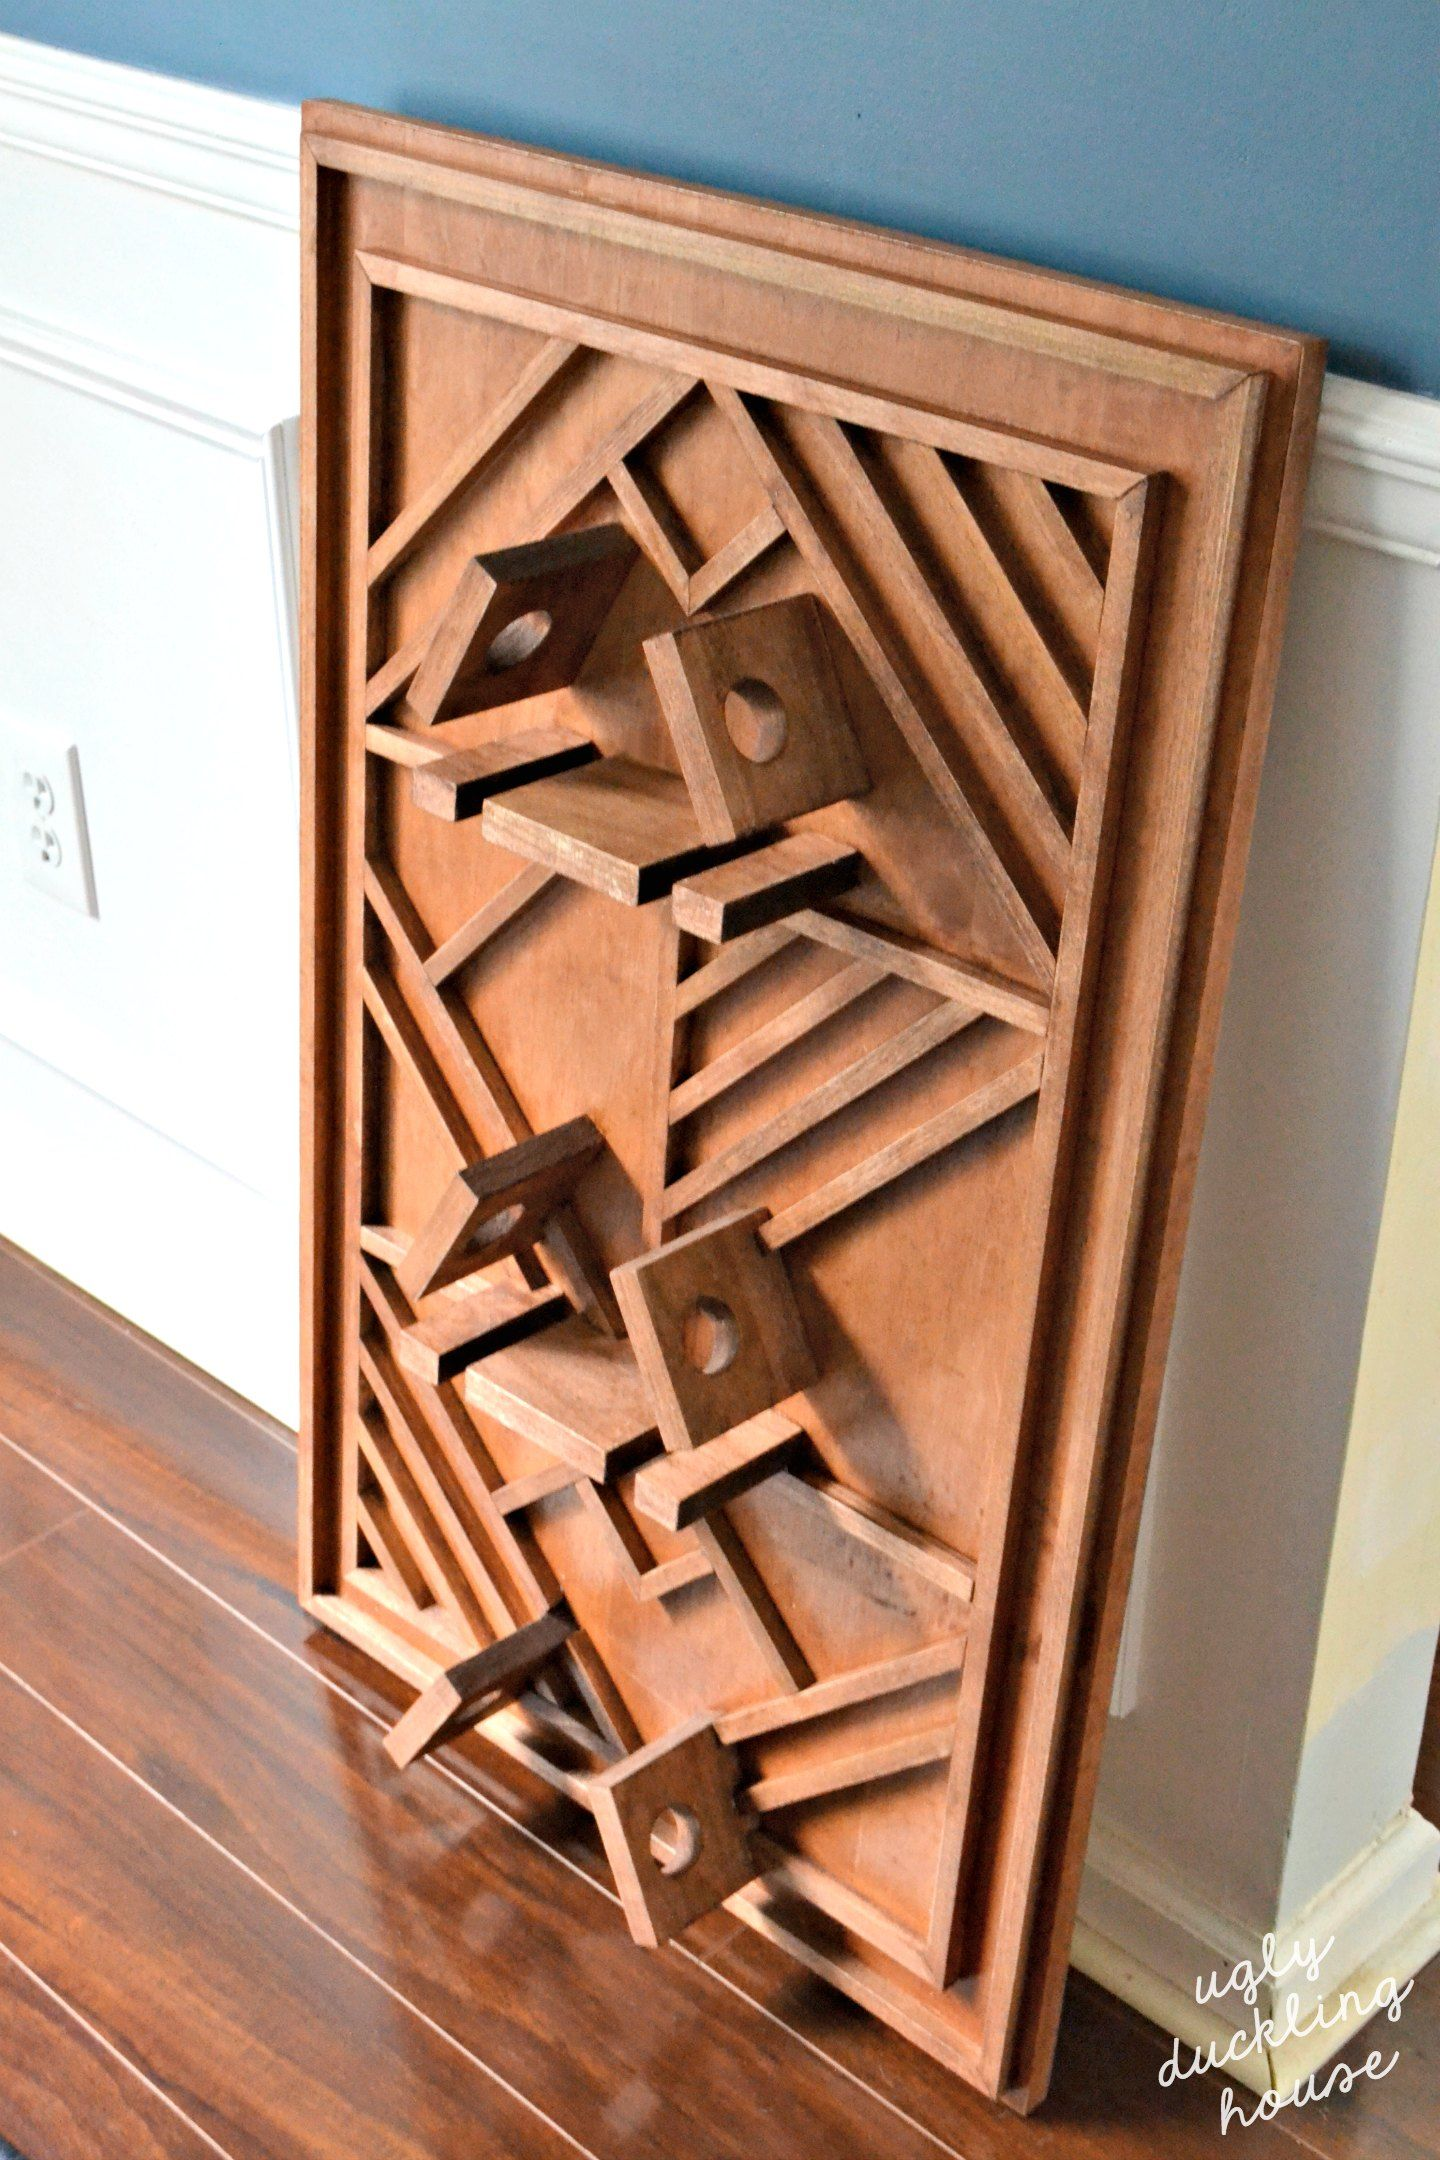 Diy plywood art wine rack plywood art diy plywood art